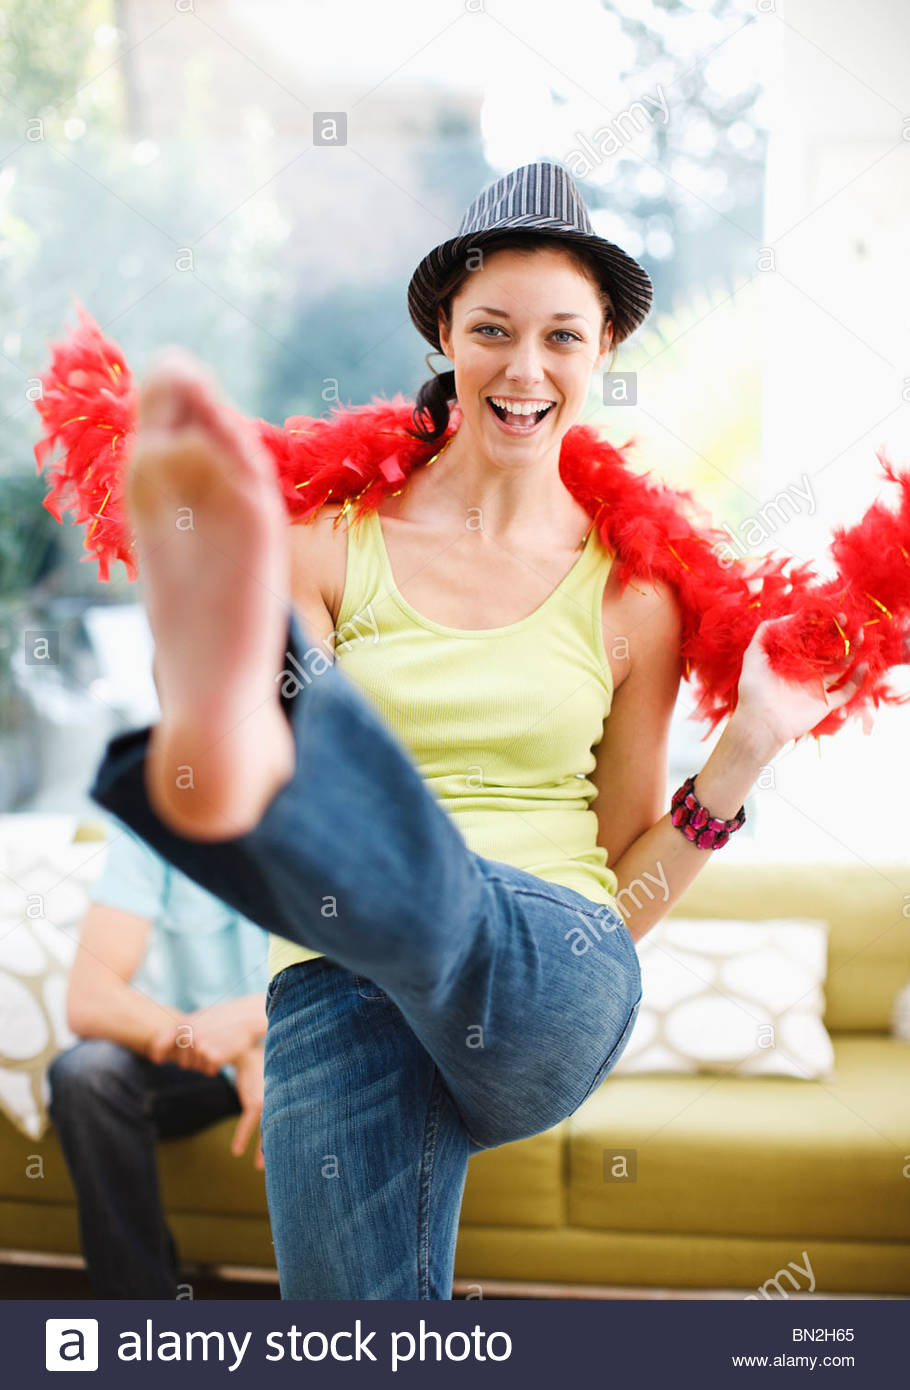 Woman Dancing in hat e piuma boa Immagini Stock